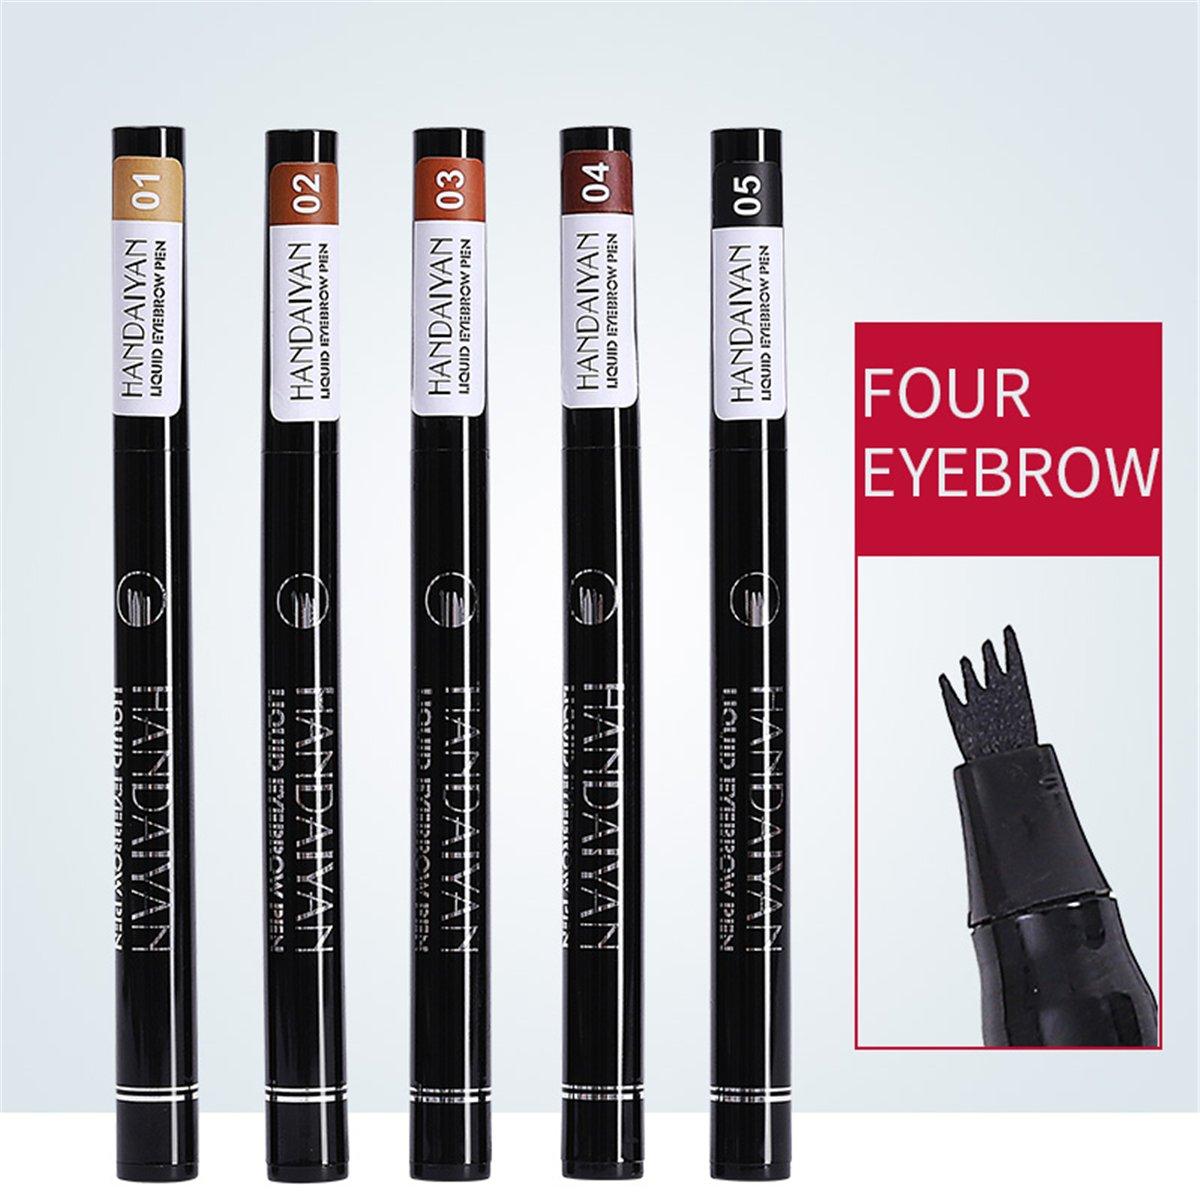 AIKIMUSE Eyebrow Tattoo Penwith 4 Tips, Liquid Long Lasting Brow Pencil Waterproof Smudge-prooffor Eye Makeup (02)